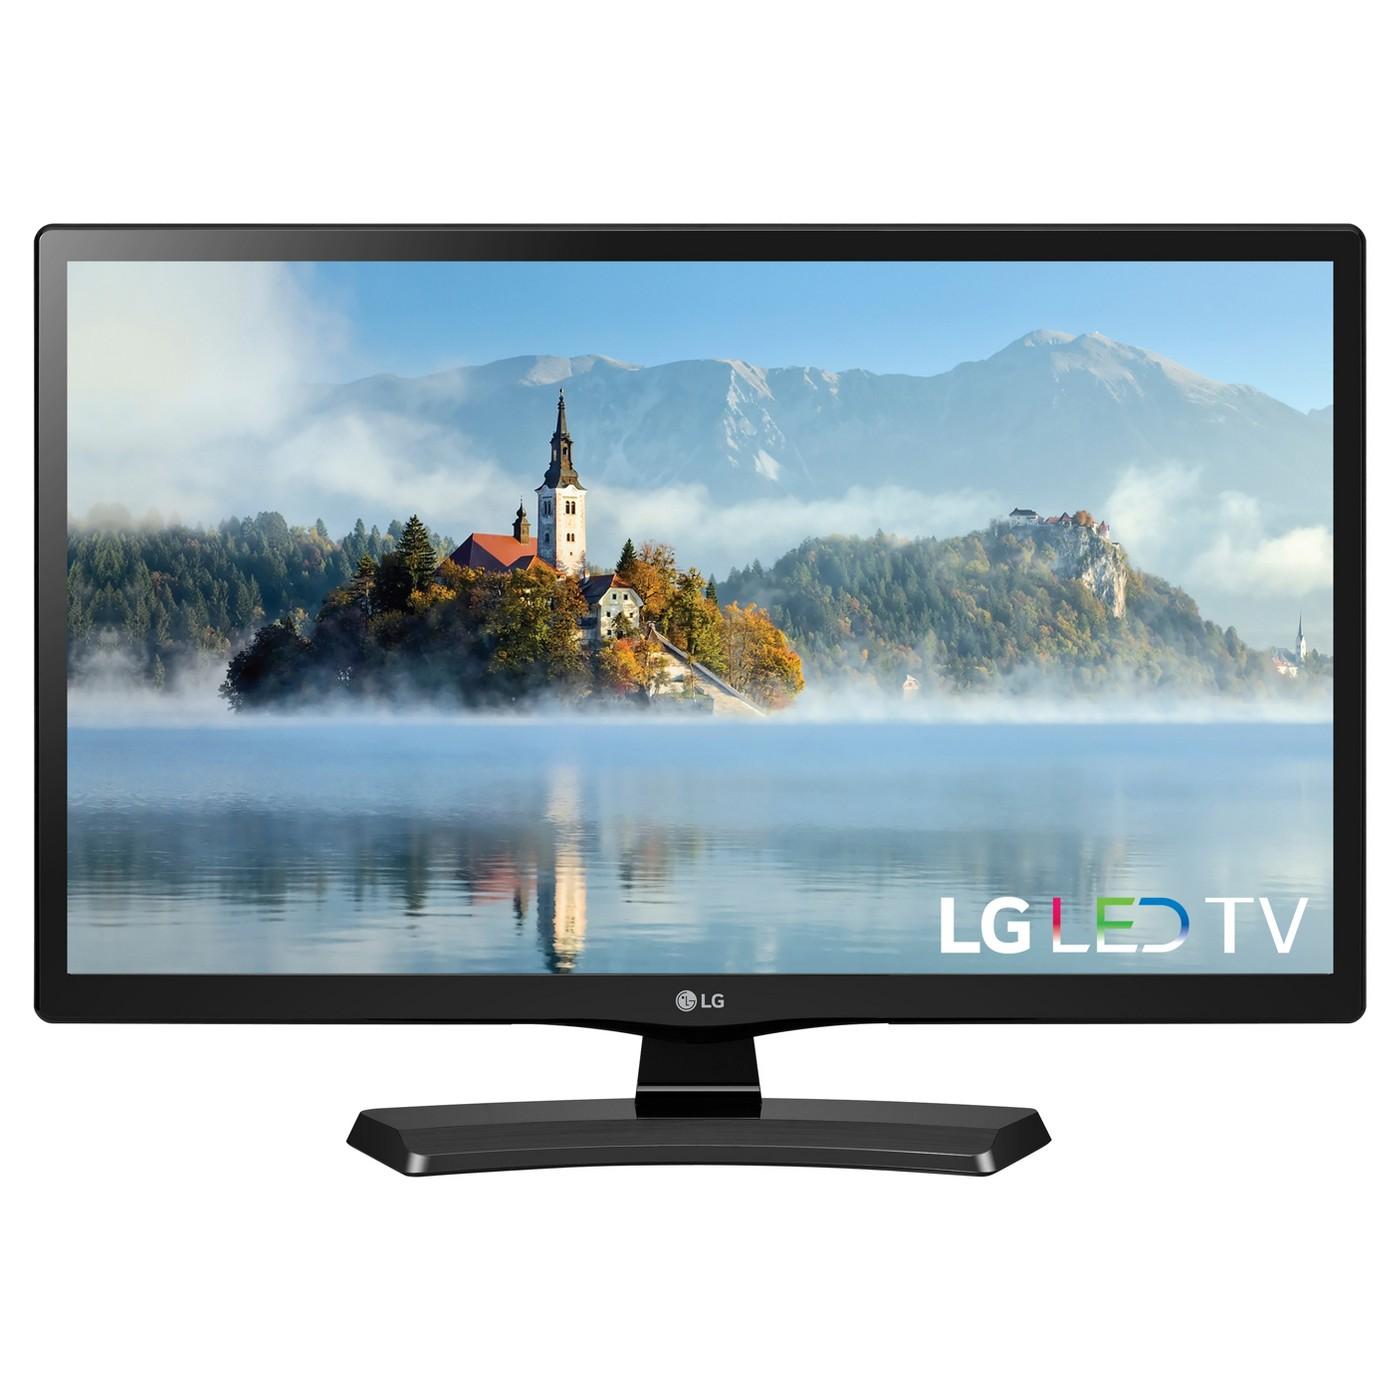 "LG 24"" Class 720p 60Hz LED HDTV - 24LF454B - image 1 of 8"